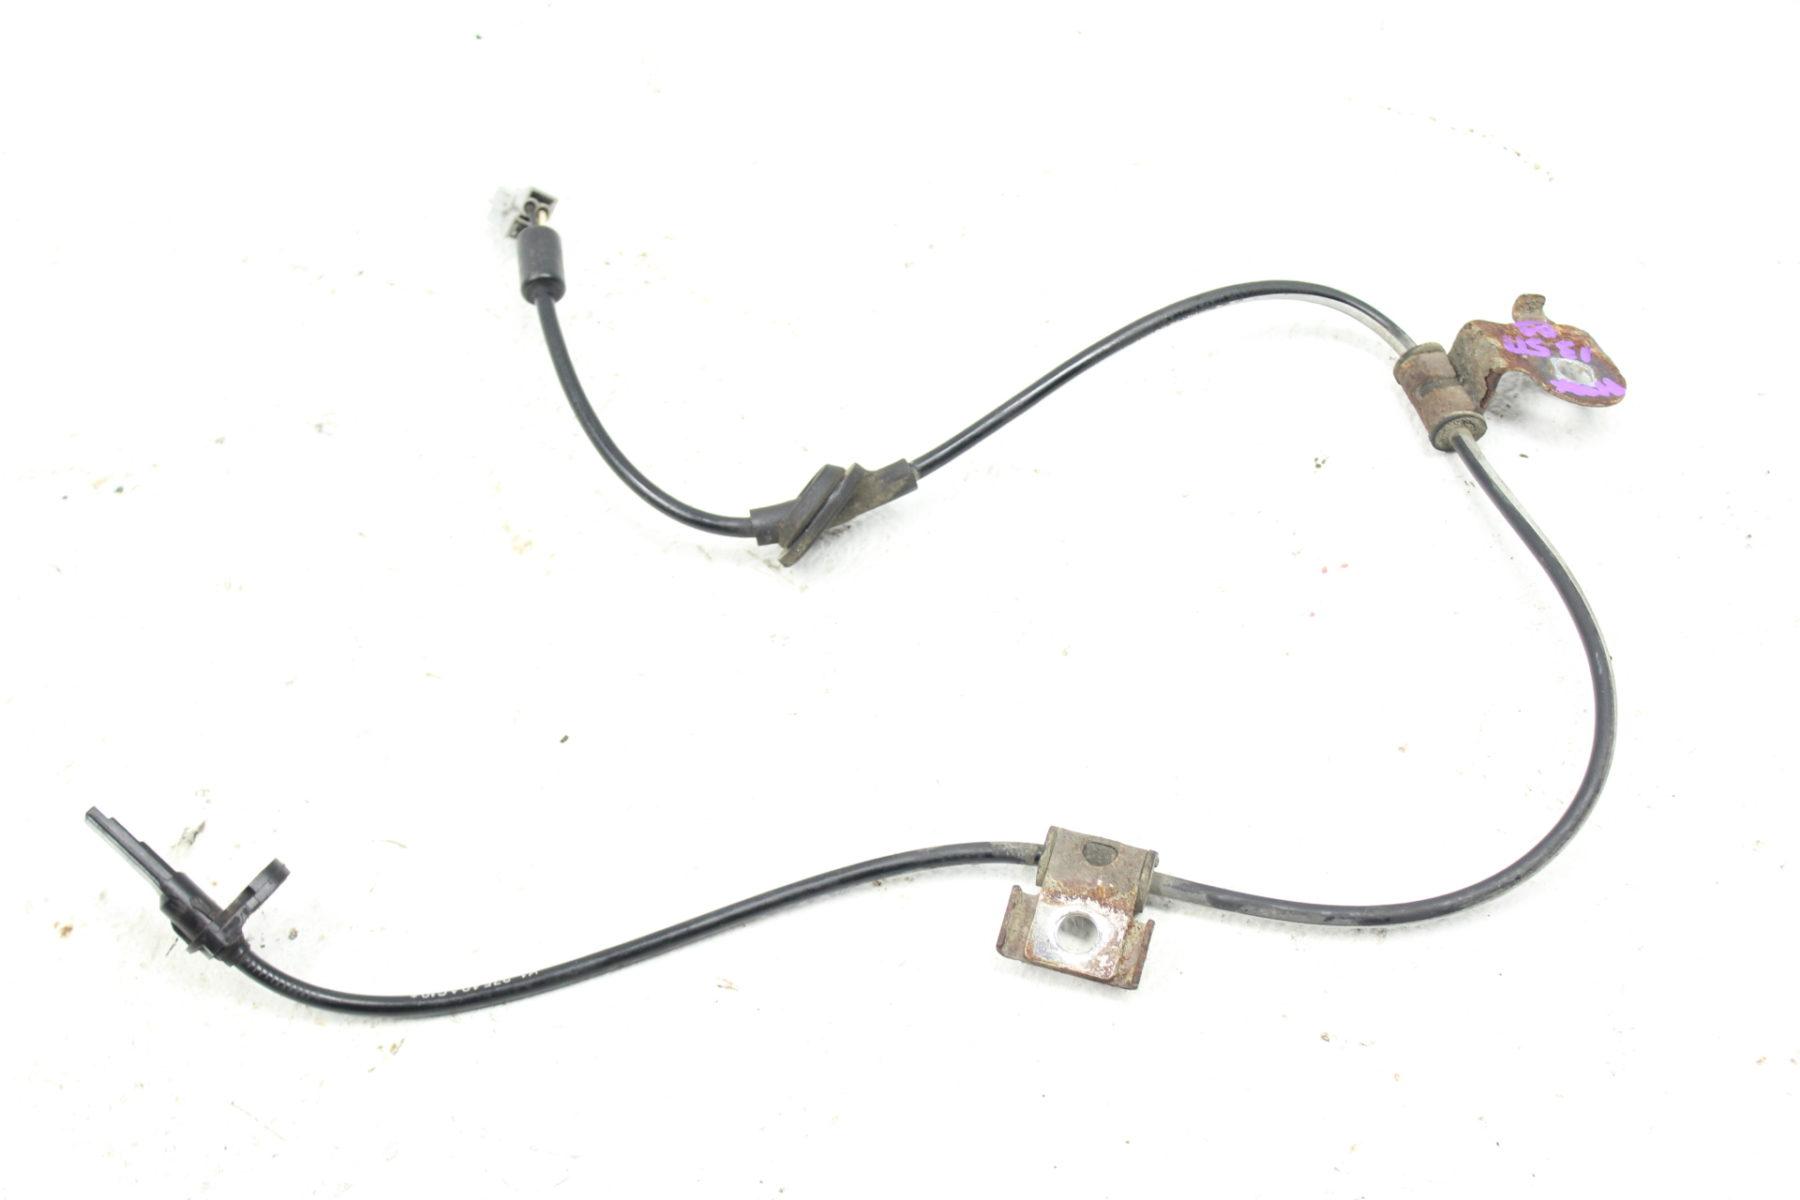 08 14 Subaru Impreza Wrx Sti Abs Speed Sensor